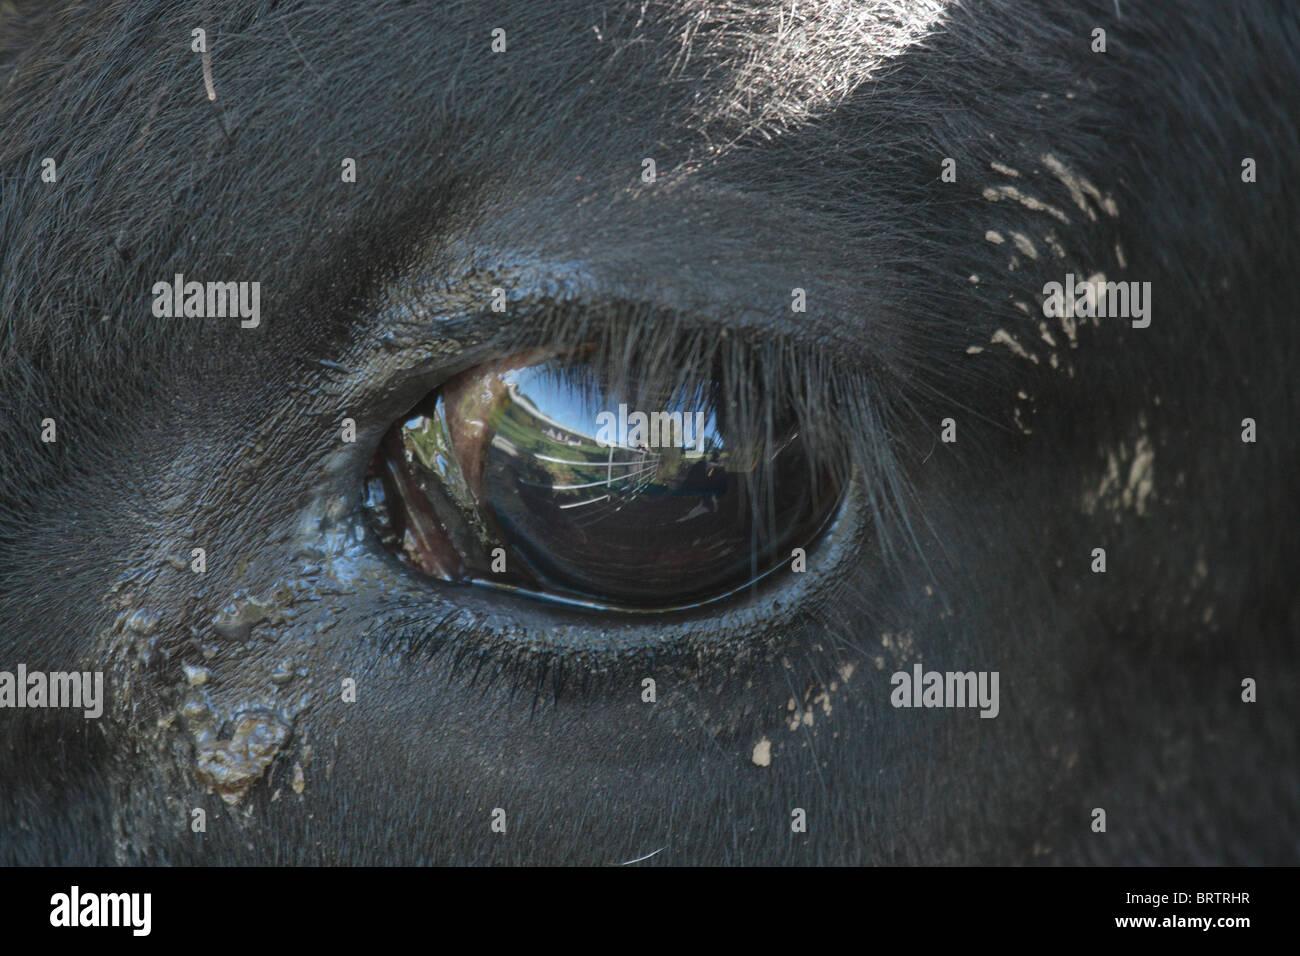 Mammalian Eye - Stock Image